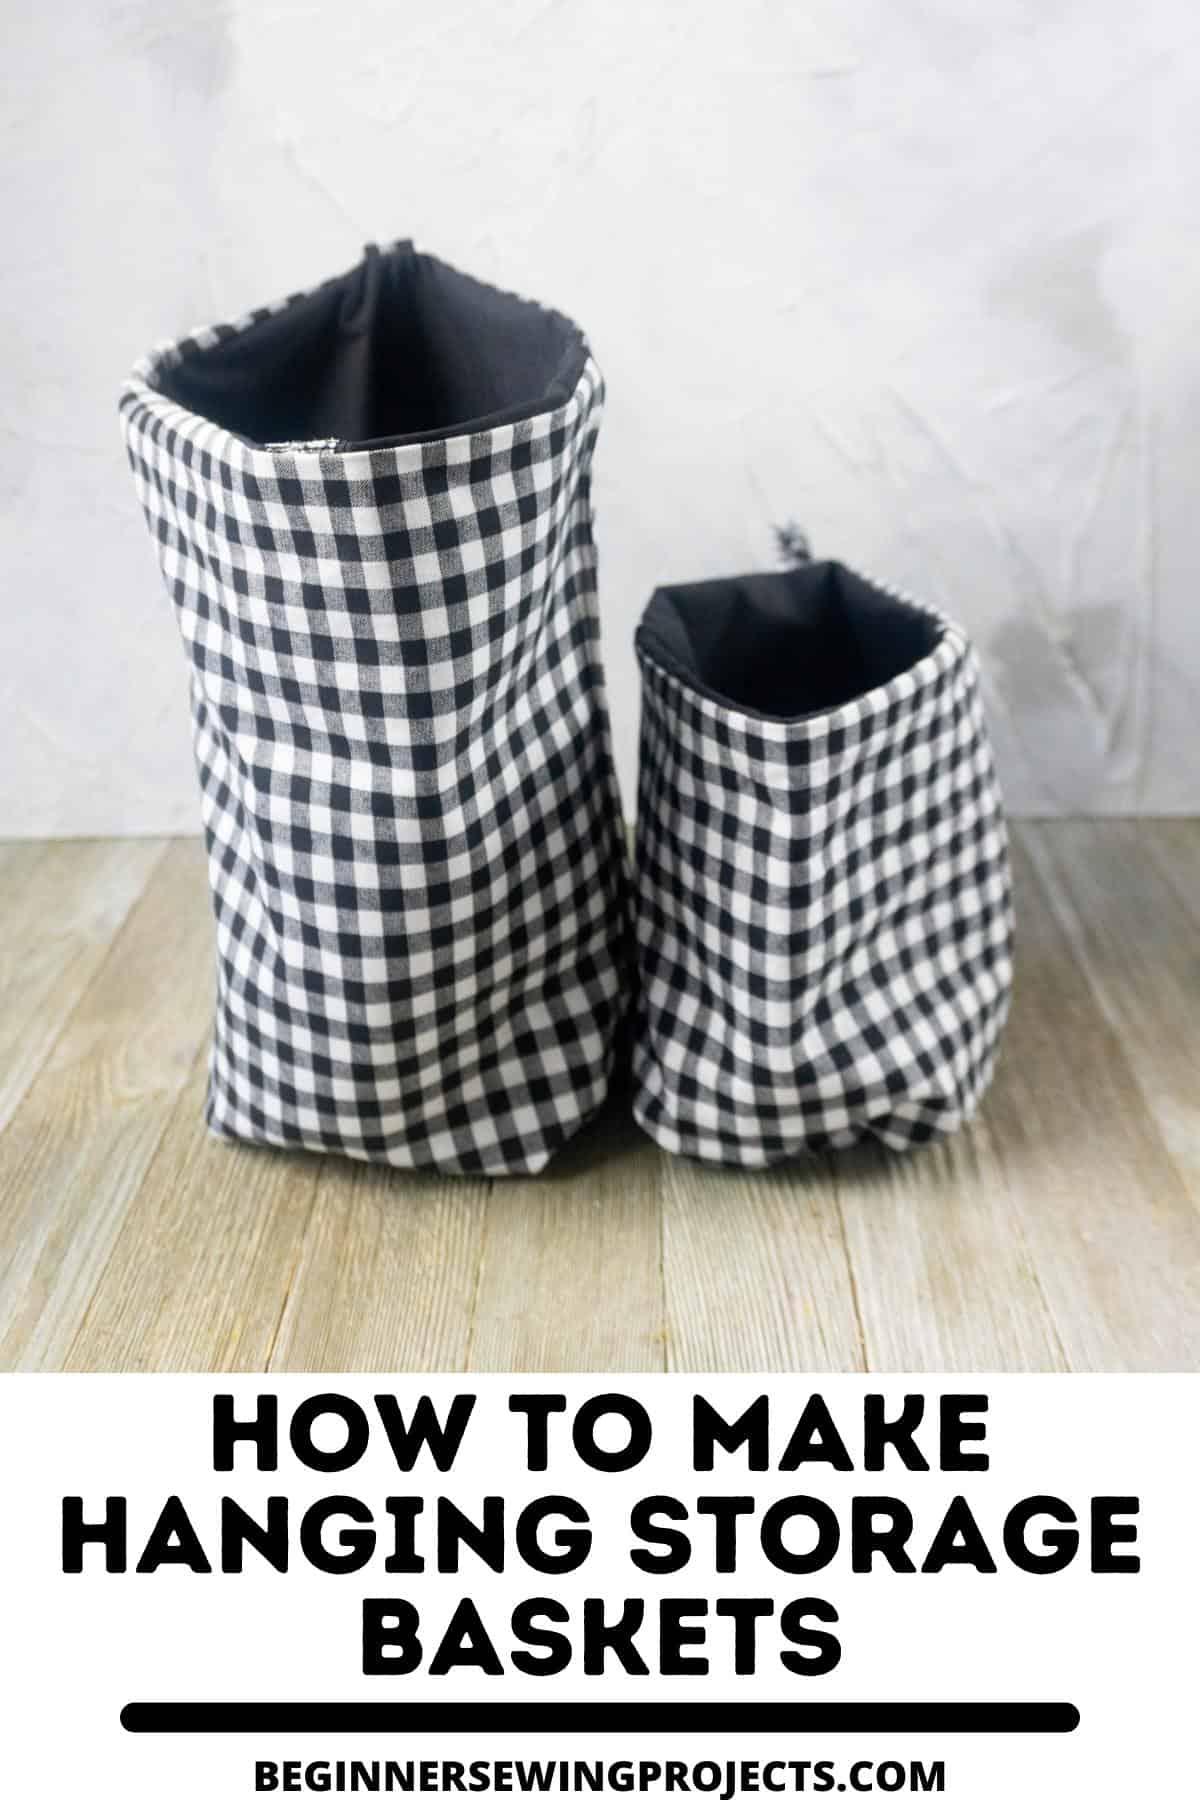 How To Make Hanging Storage Baskets